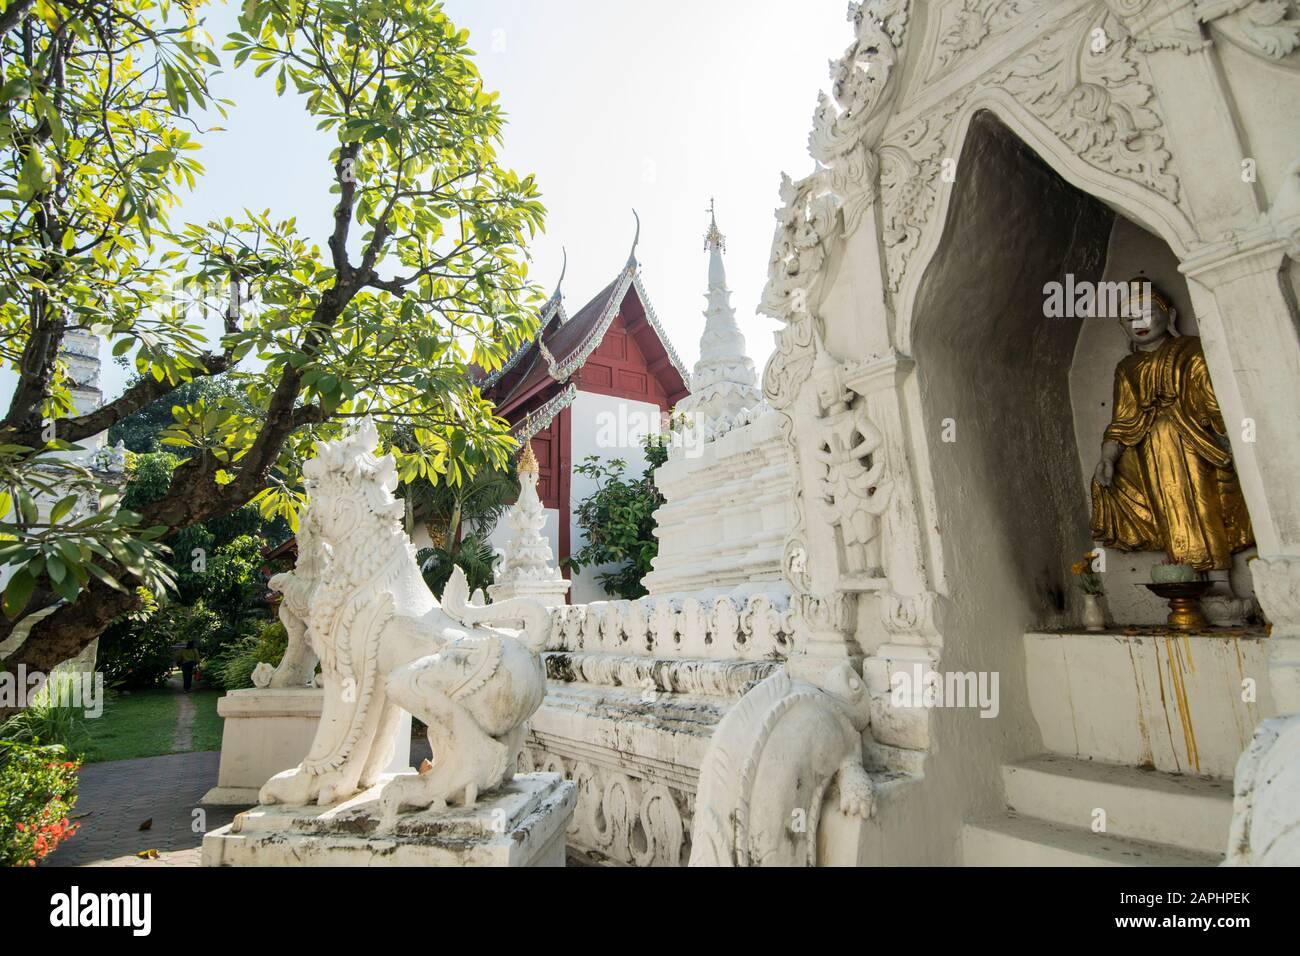 Der Wat Mahawan in der Stadt Chiang Mai im Norden Thailands. Thailand, Chiang Mai, November 2019 Stockfoto